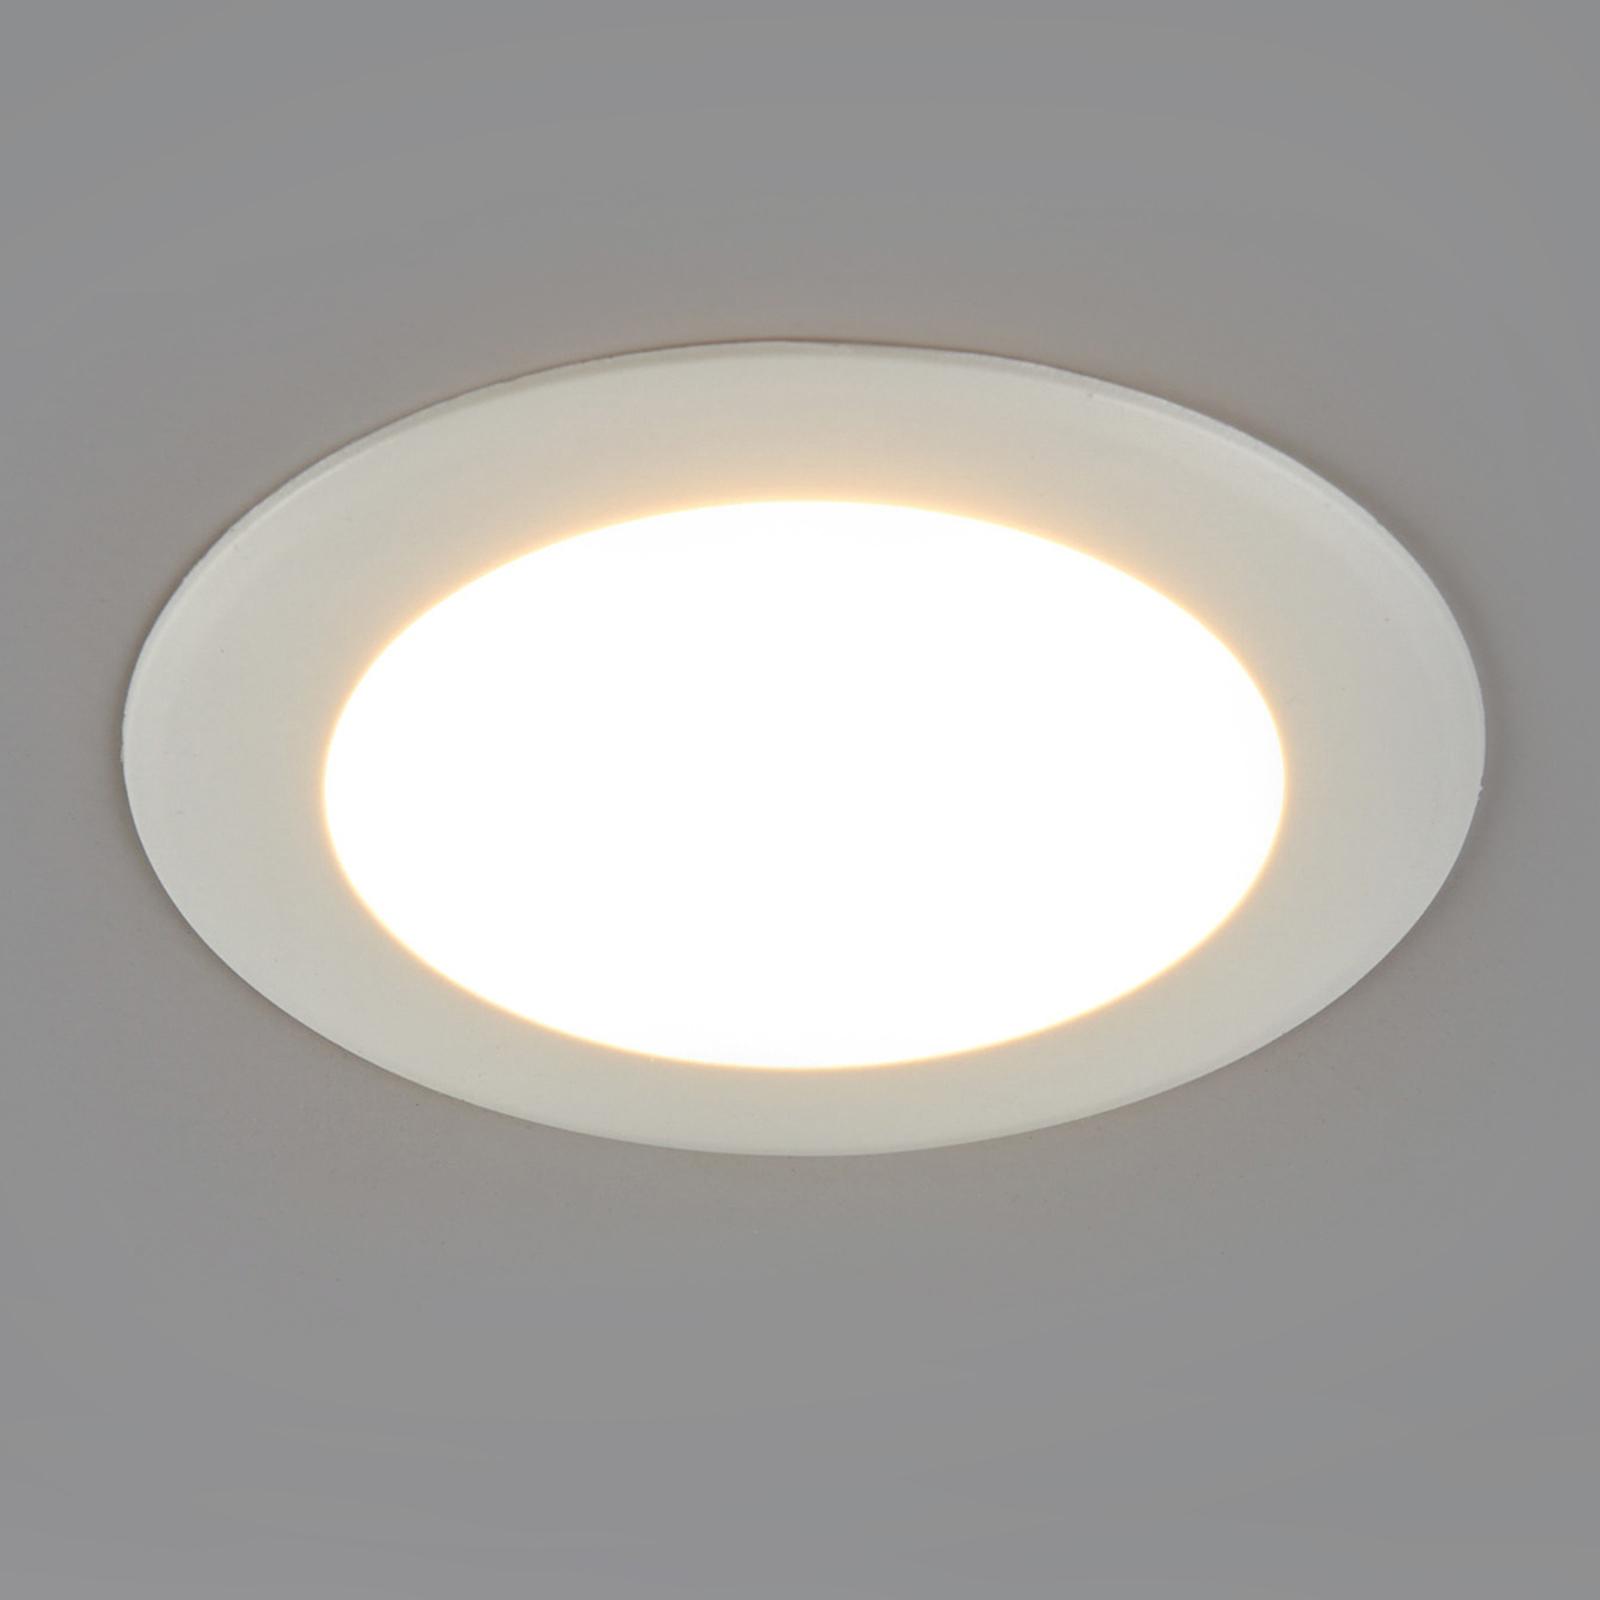 Ronde LED inbouwlamp Arian, 9,2 cm 6W